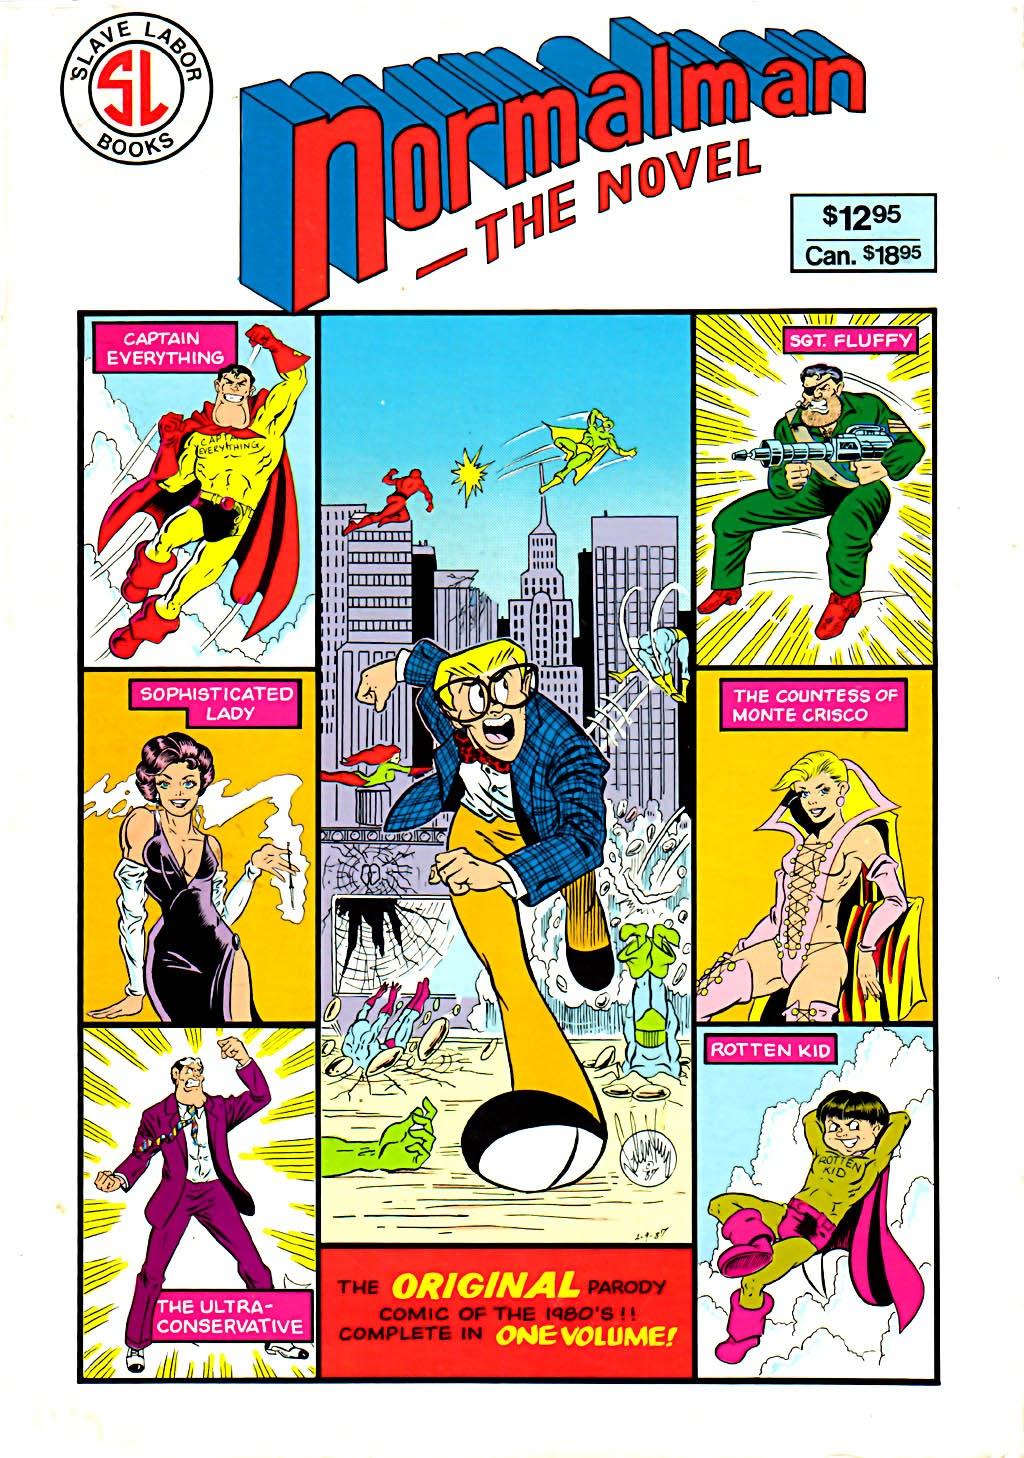 Read online Normalman - The Novel comic -  Issue # TPB (Part 1) - 1